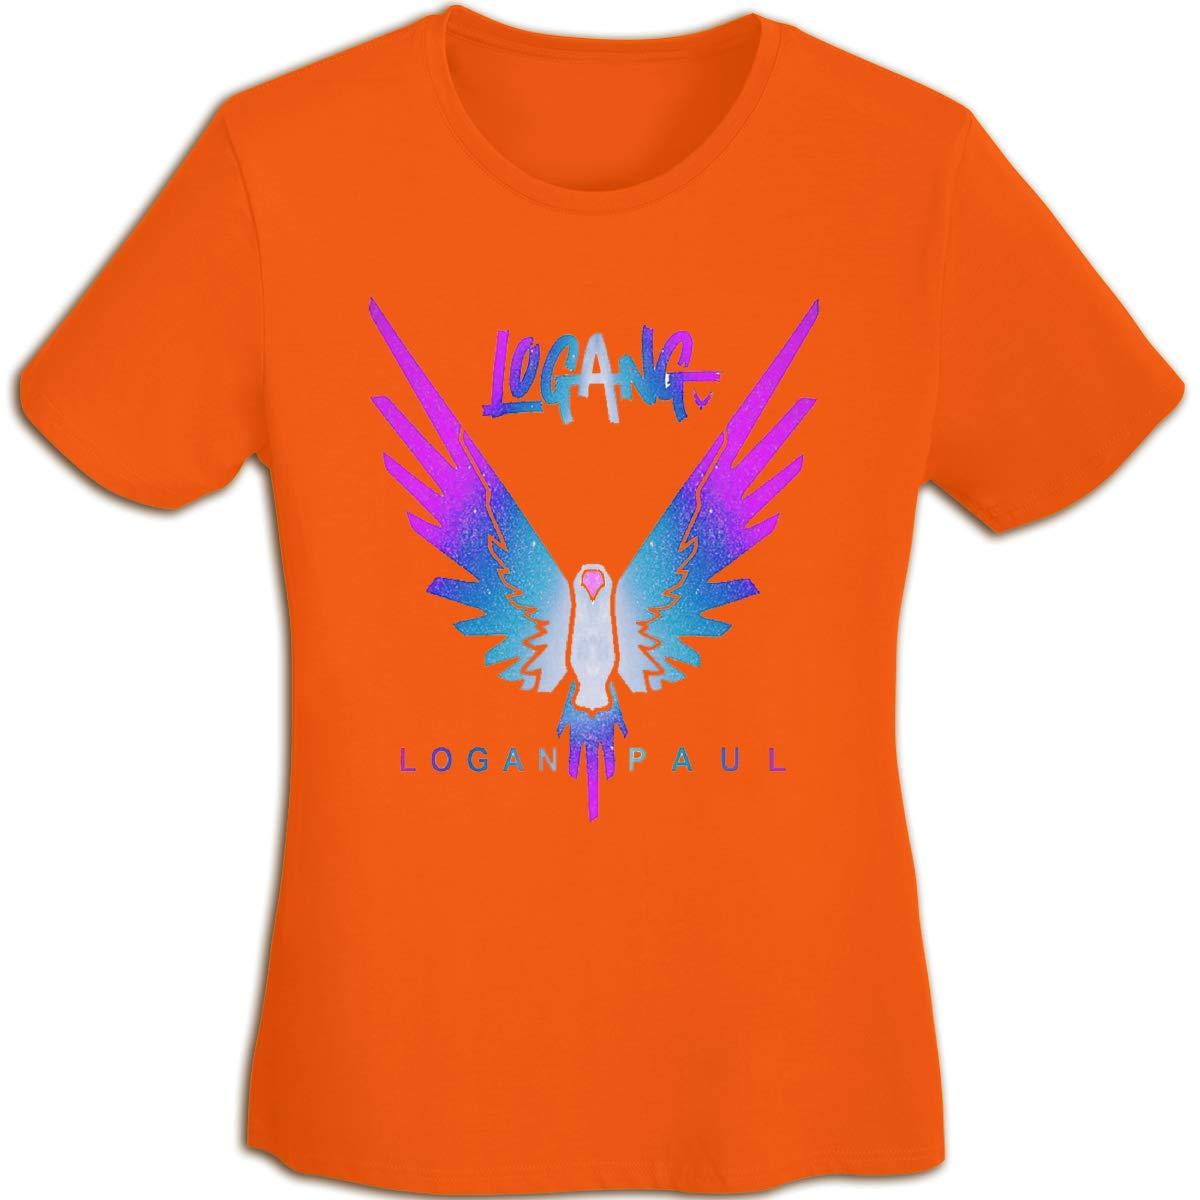 Women's T Shirt Jake Paul Logang Logan Paul Maverick Tee Shirts T-Shirt Short-Sleeve Round Neck Tshirt for Womens Girls Orange M by BKashy